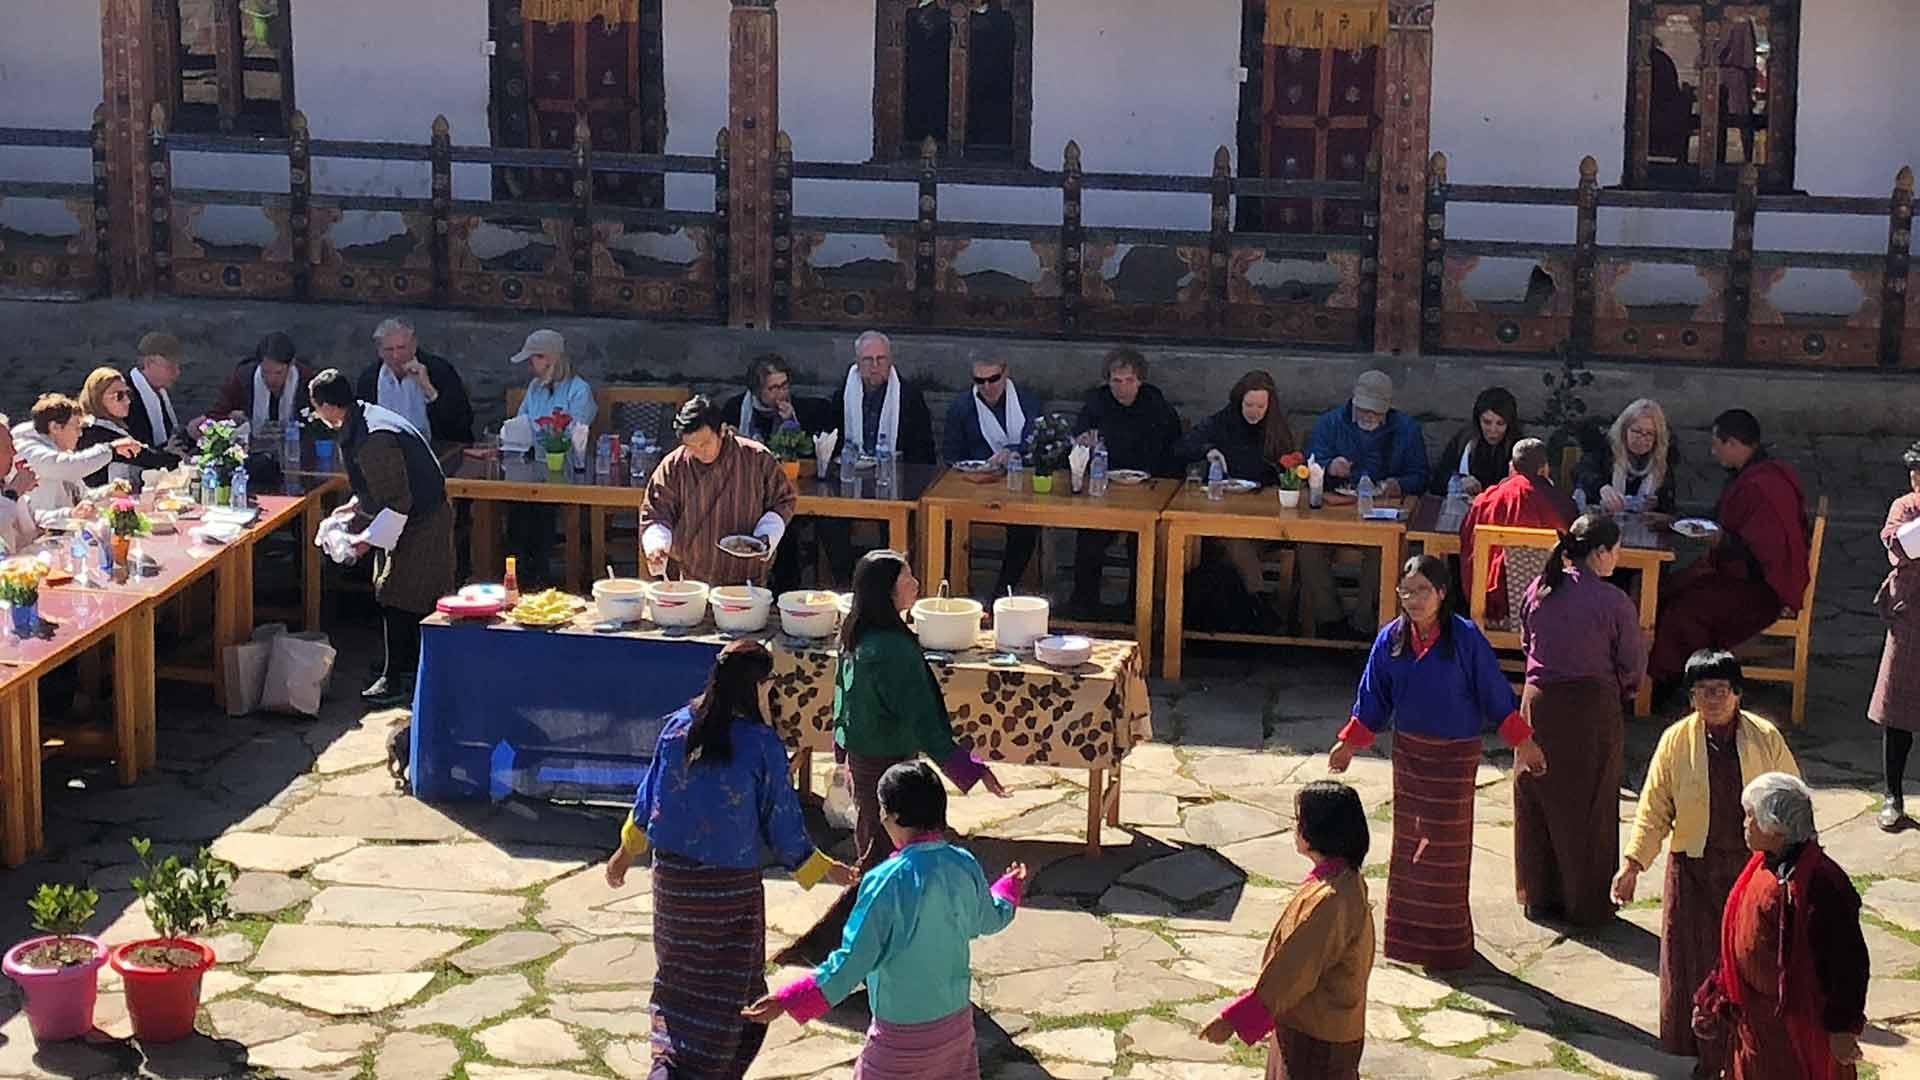 Bhutan, meal in courtyard